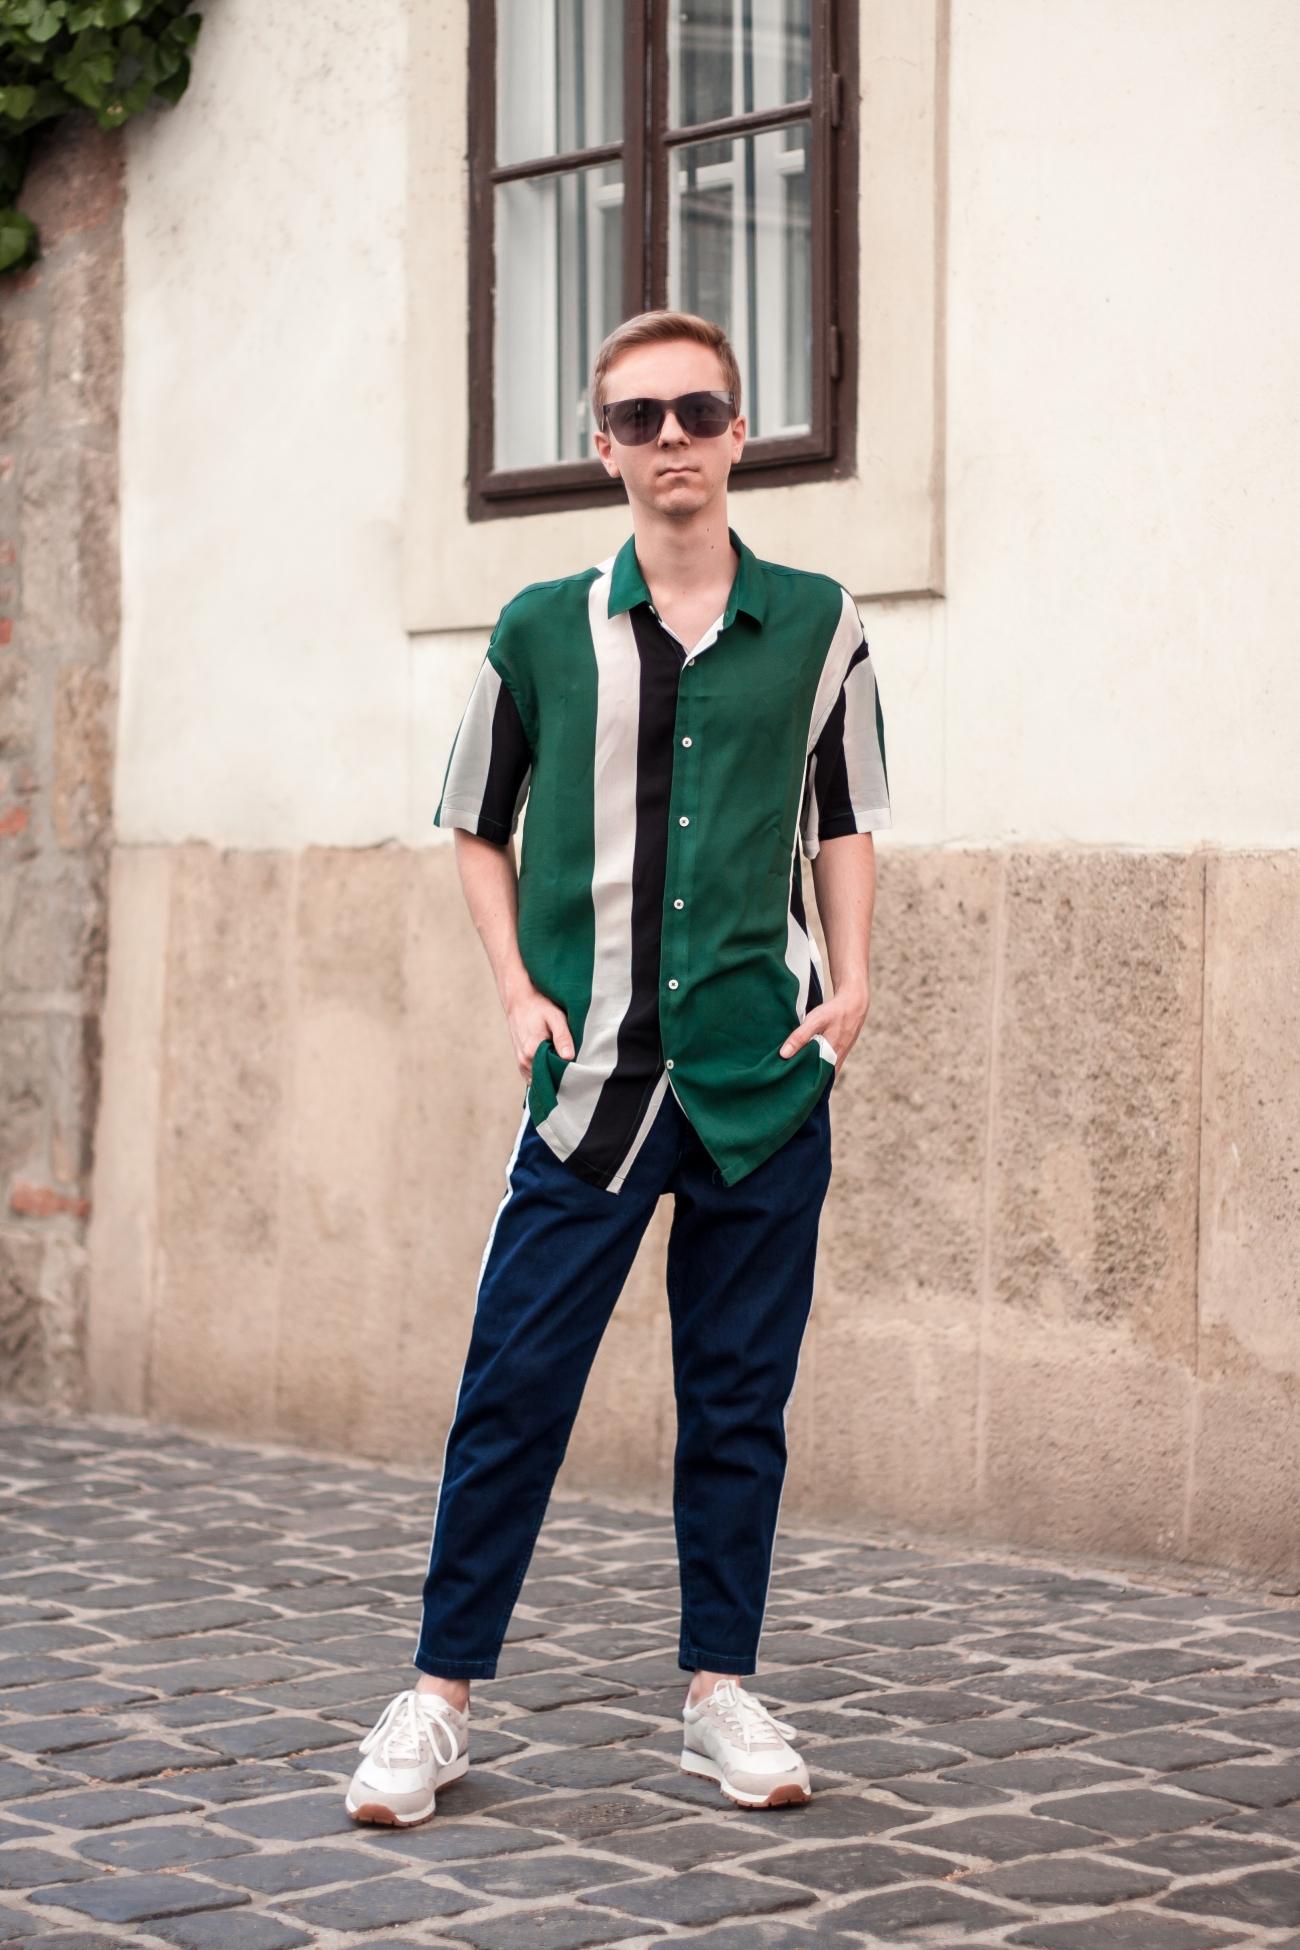 Colour Block Shirt With Acryl Sunglasses | Balazs Zsalek